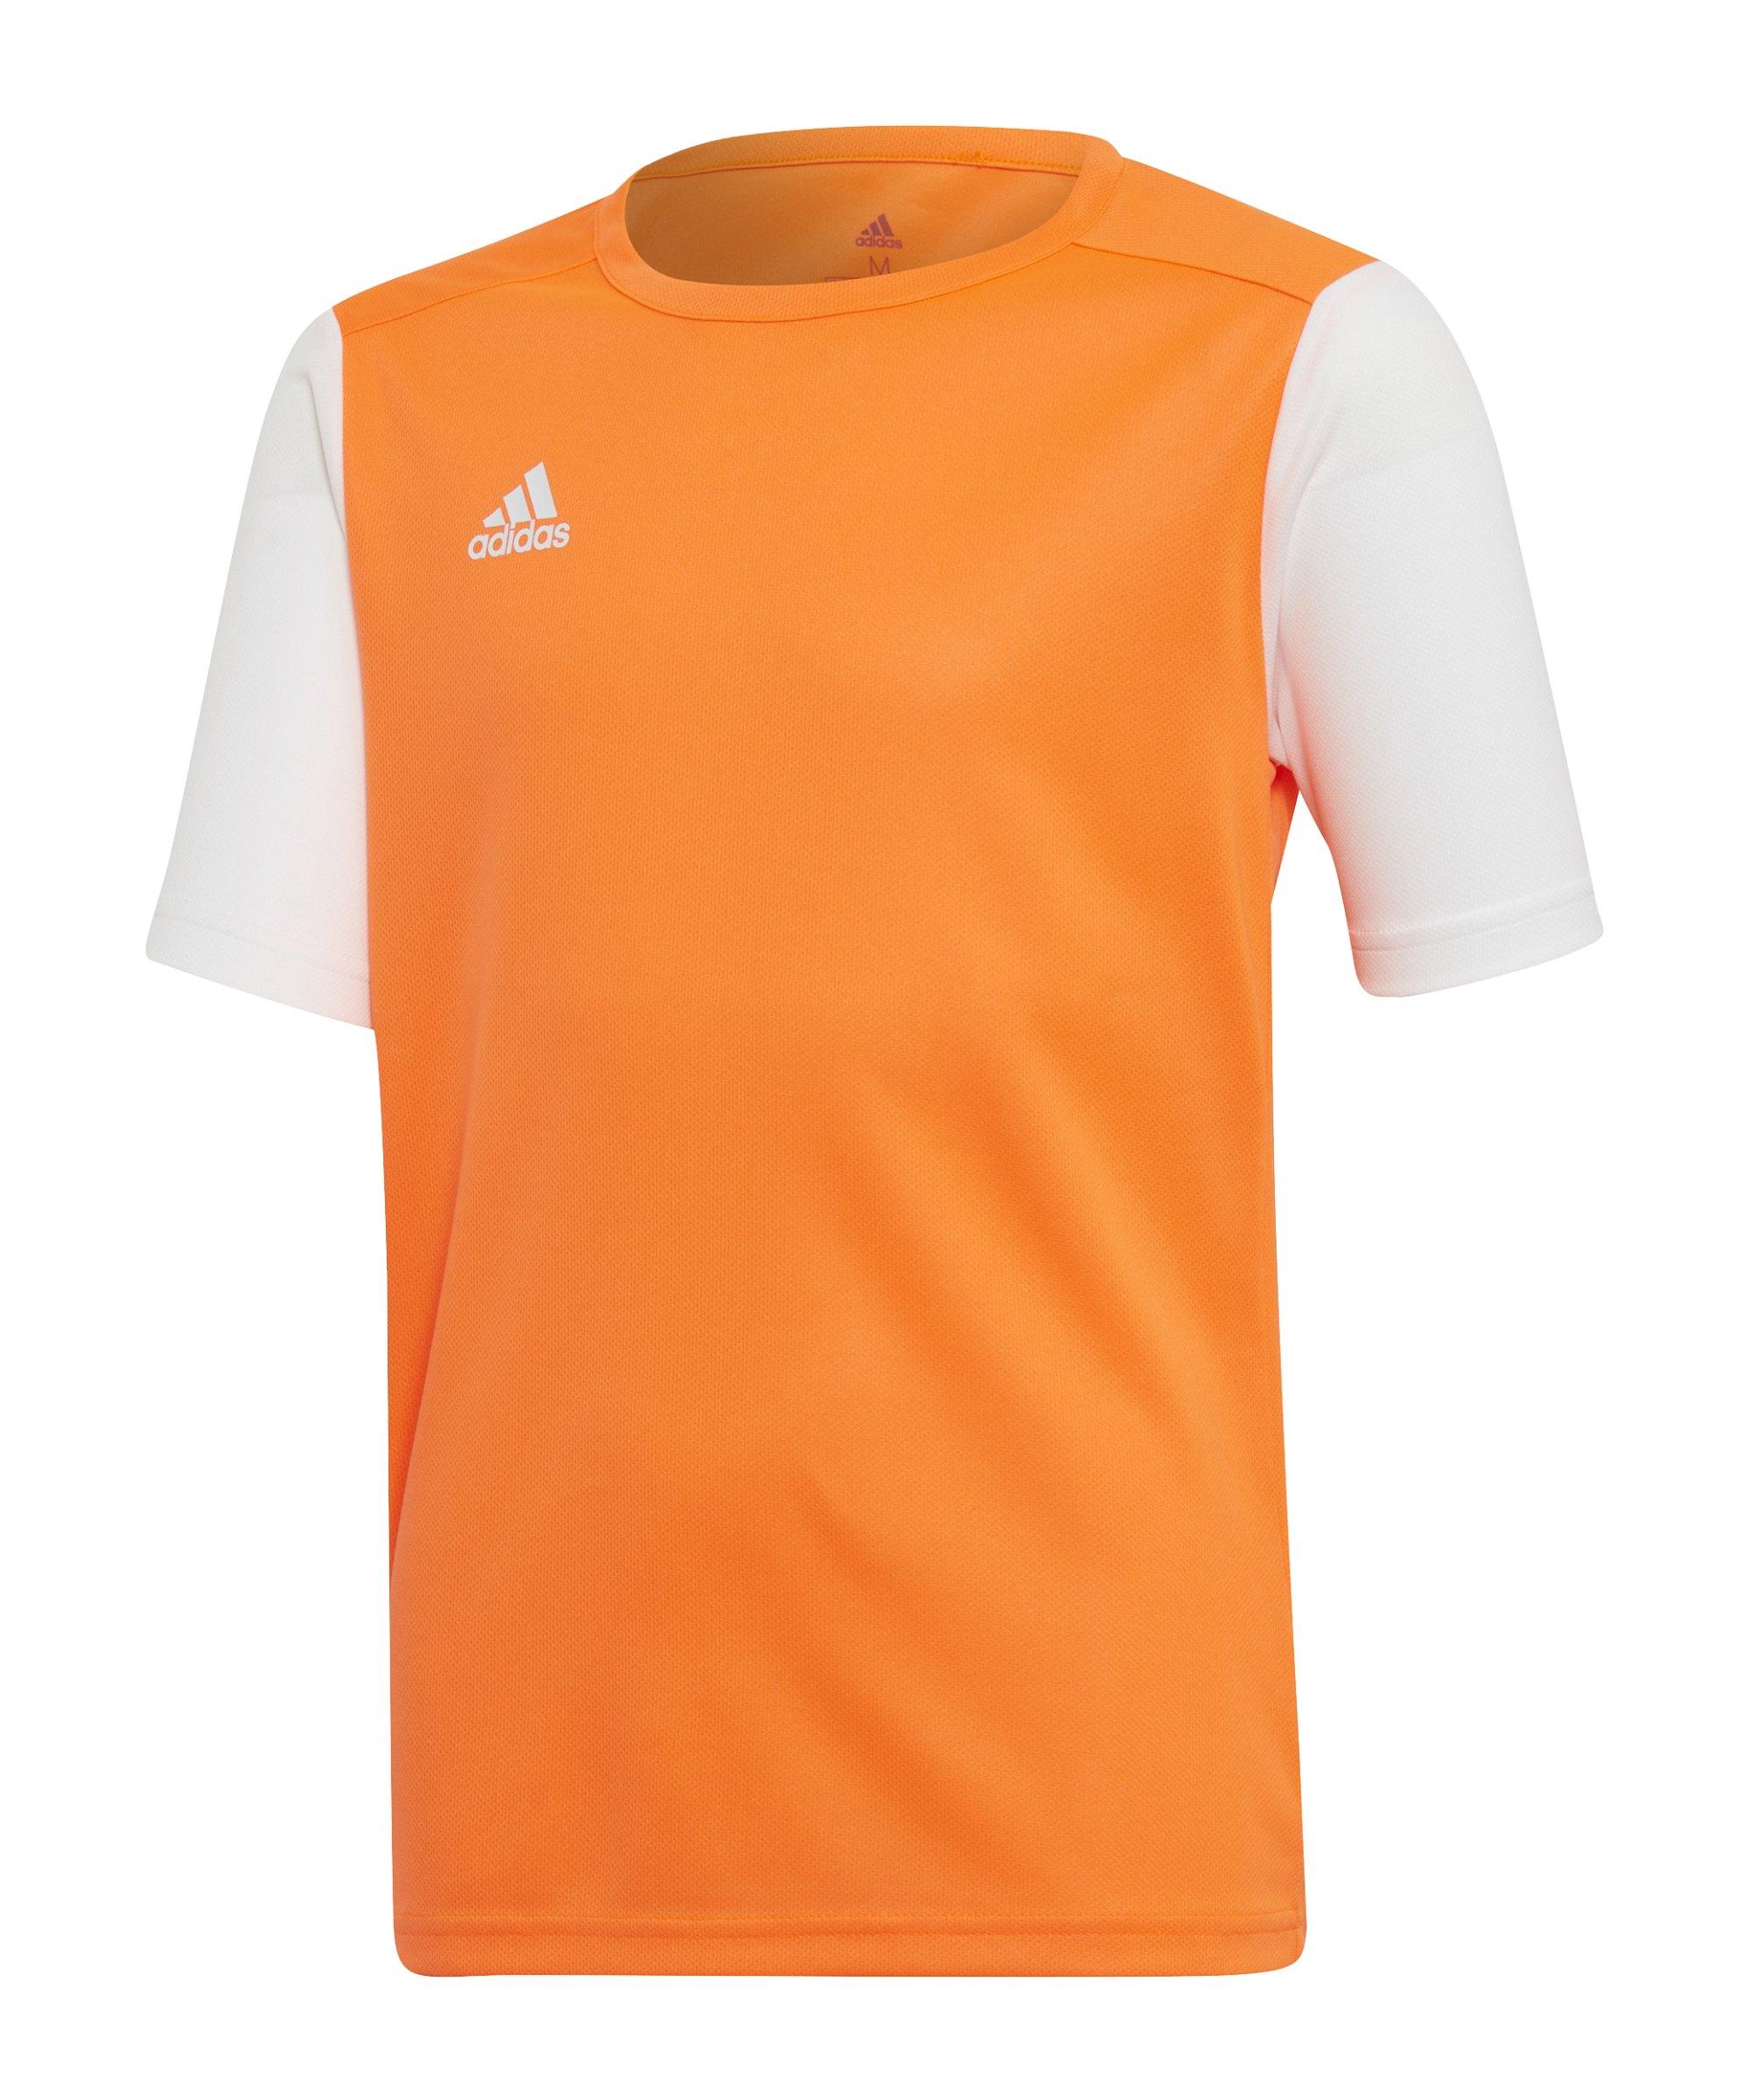 adidas Estro 19 Trikot kurzarm Kids Orange Weiss - orange